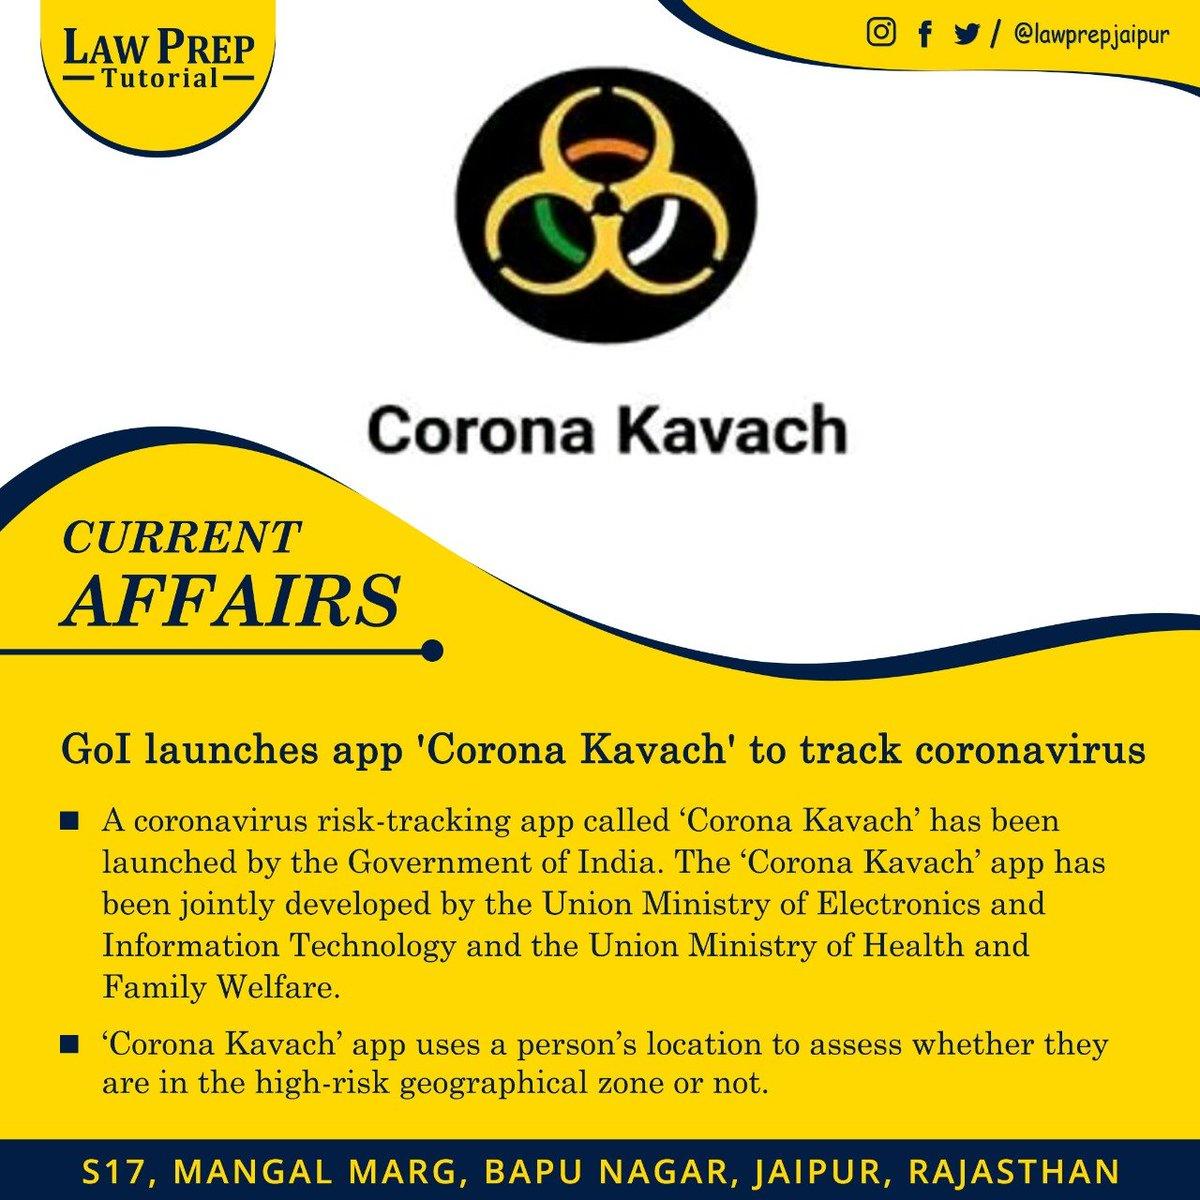 Stay connected for more such Current Affairs.  #LawPrepJaipur #LawPrep #CLAT2020 #CurrentAffairs #GoI #GovernmentOfIndia #CoronaKavach #CoronaVirus #Covid19 #CoronaVirusIndia #Covid19Outbreak #Lockdownpic.twitter.com/e0XbkTAmR7